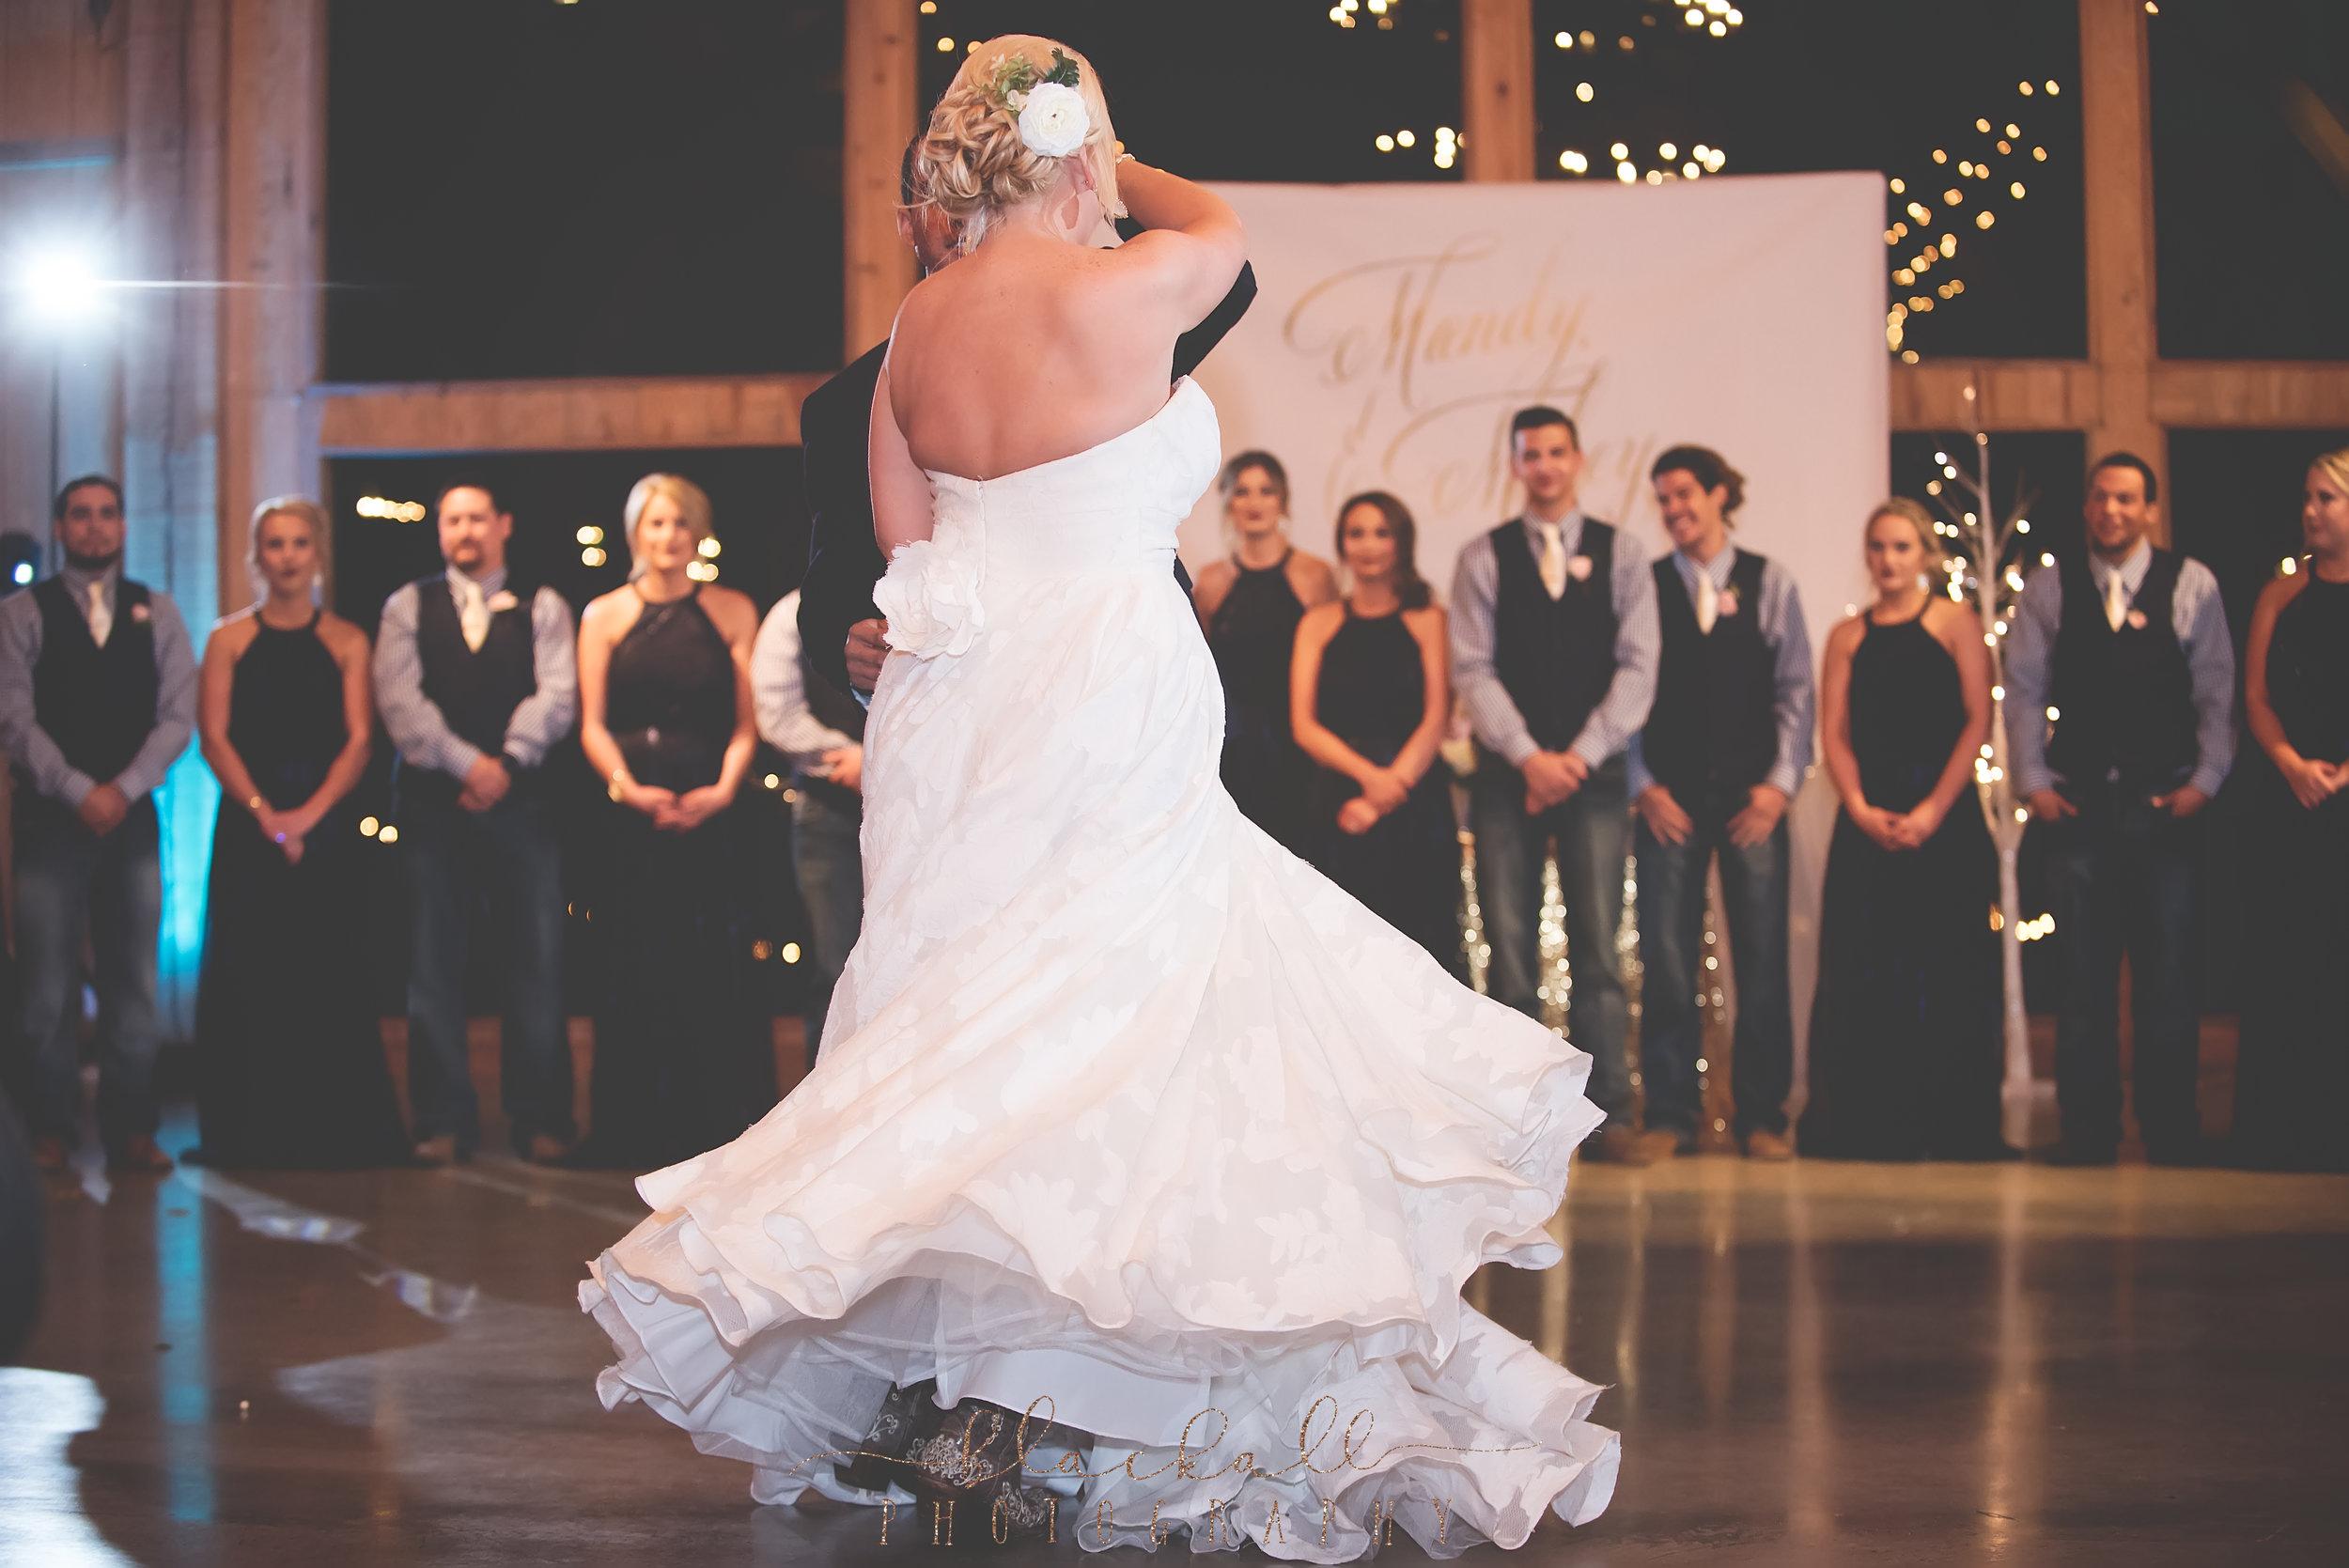 M&M WEDDING_Blackall Photography-55.JPG